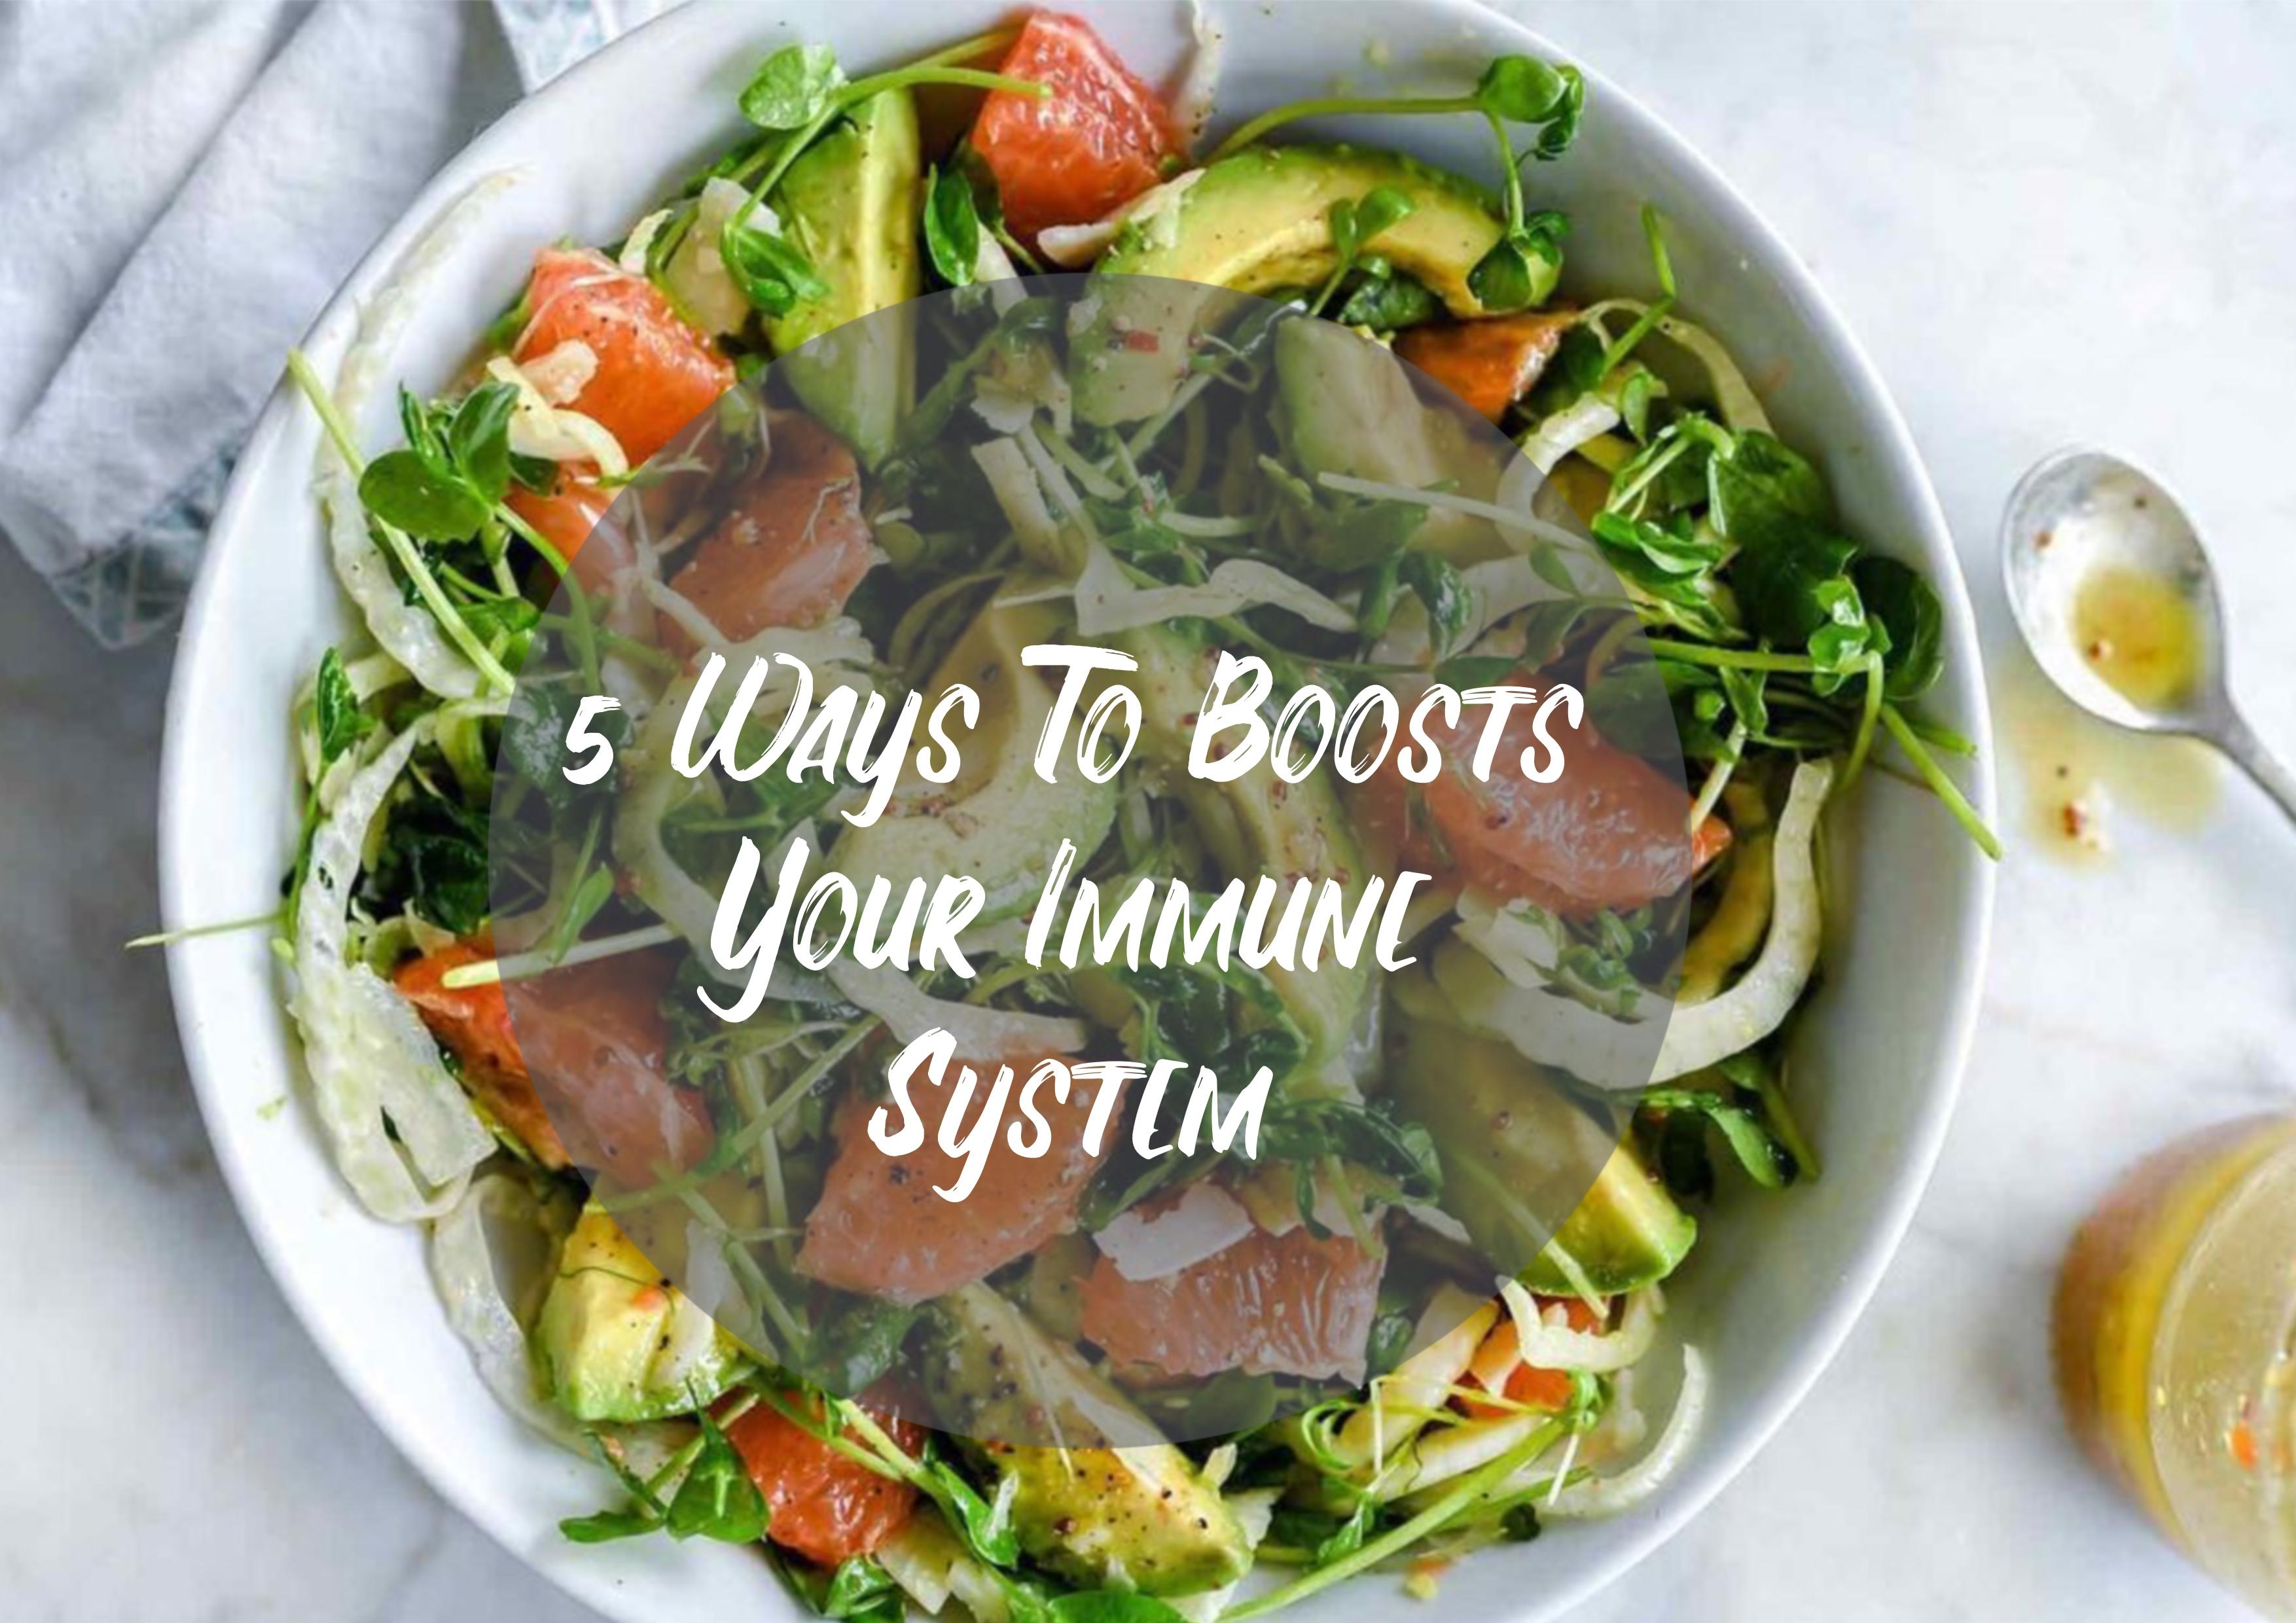 Health Tips #1